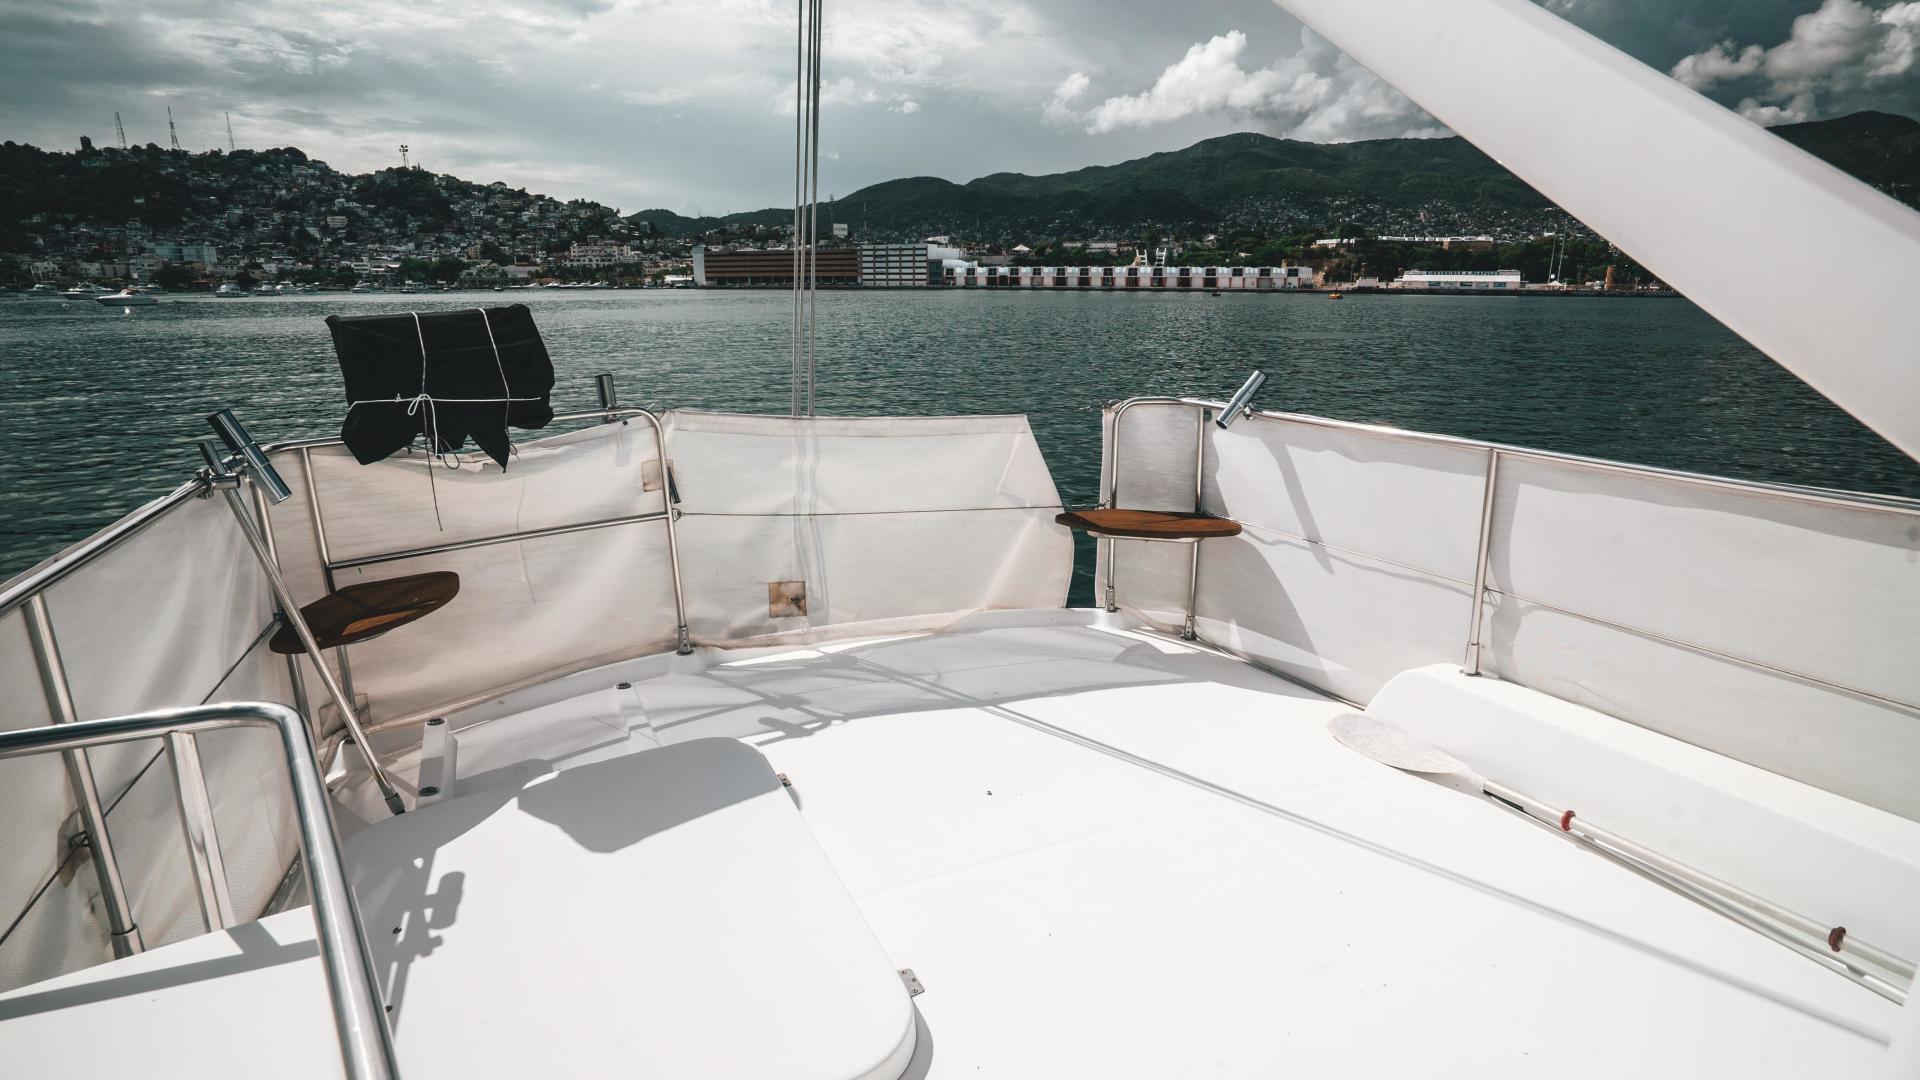 Beneteau-Swift Trawler 2008-Amadeus Acapulco-Mexico-1487032 | Thumbnail